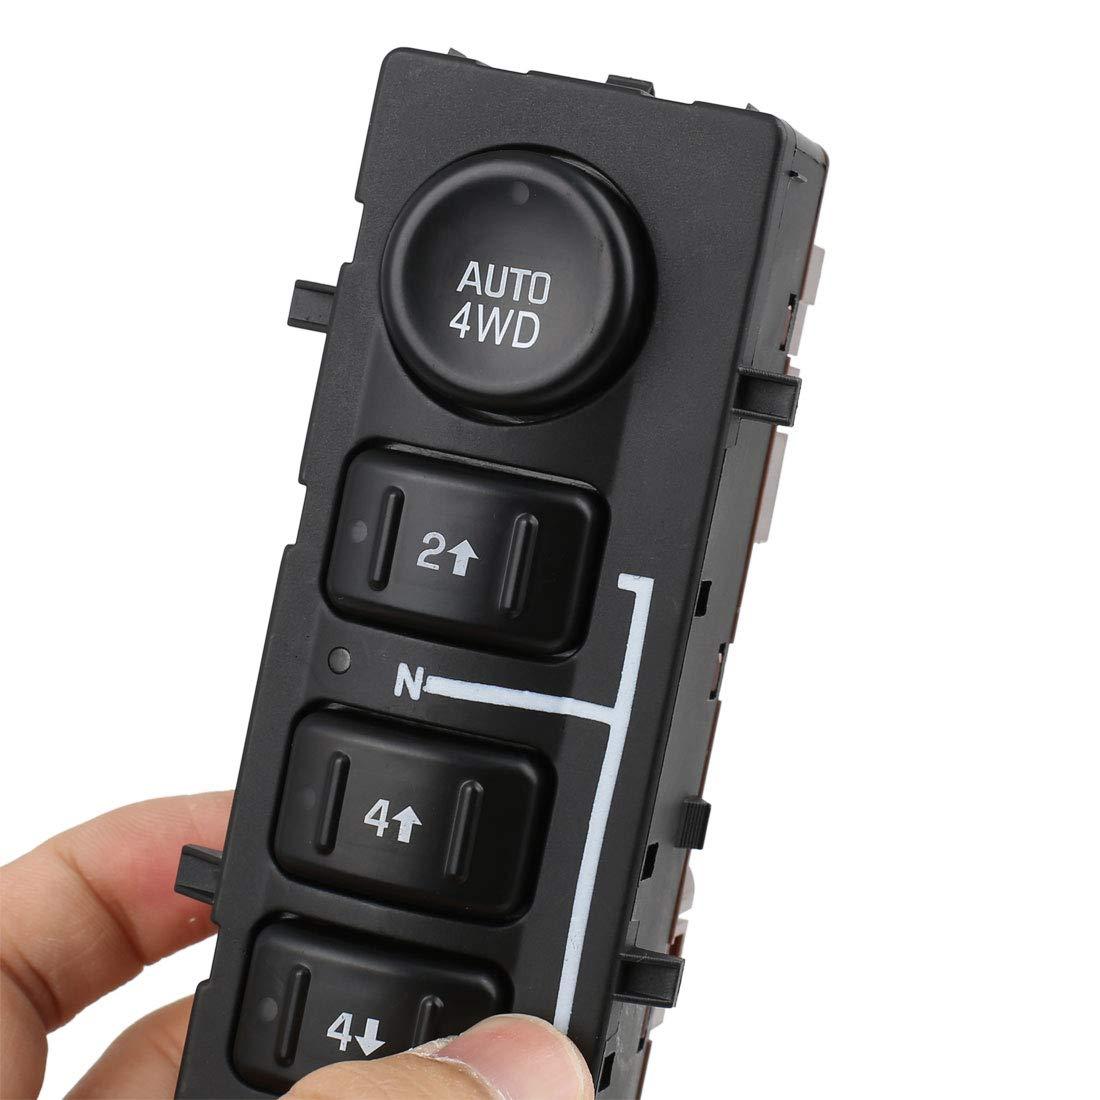 uxcell 4WD 4x4 Transfer Case Selector Dash Switch for 2003-2007 GMC Silverado 19259313